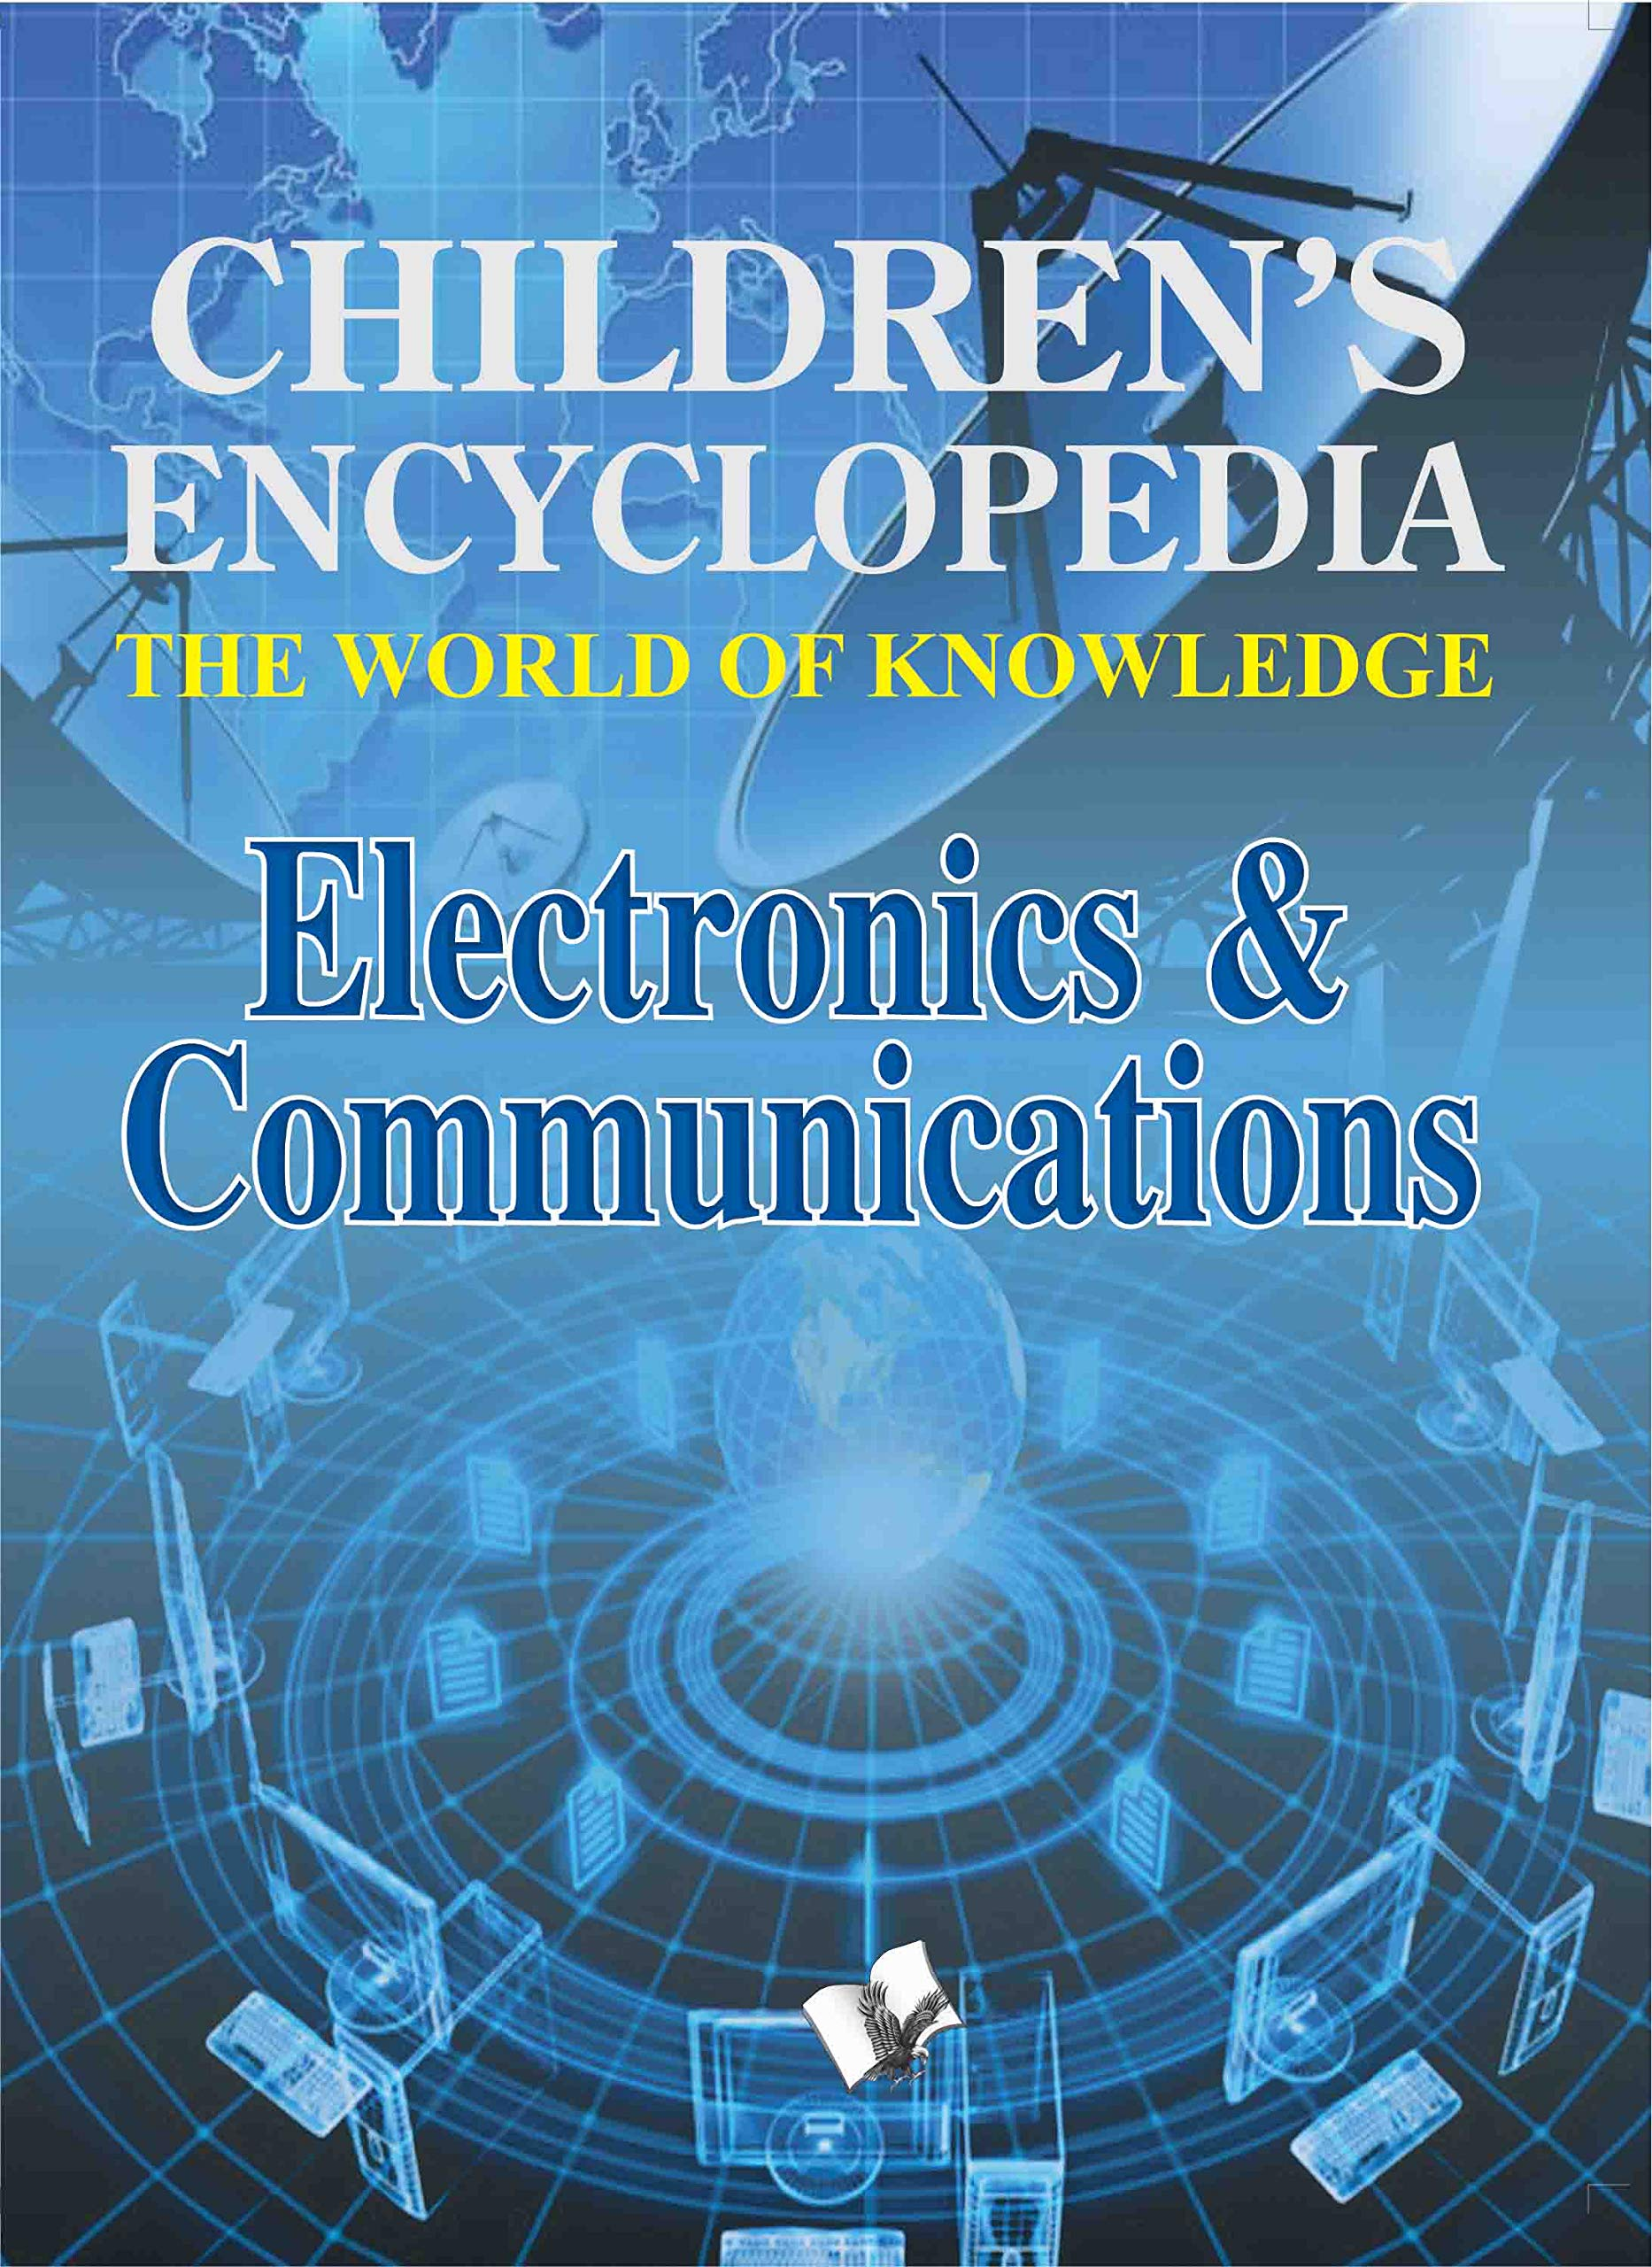 Children's Encyclopedia -  Electronics & Communications